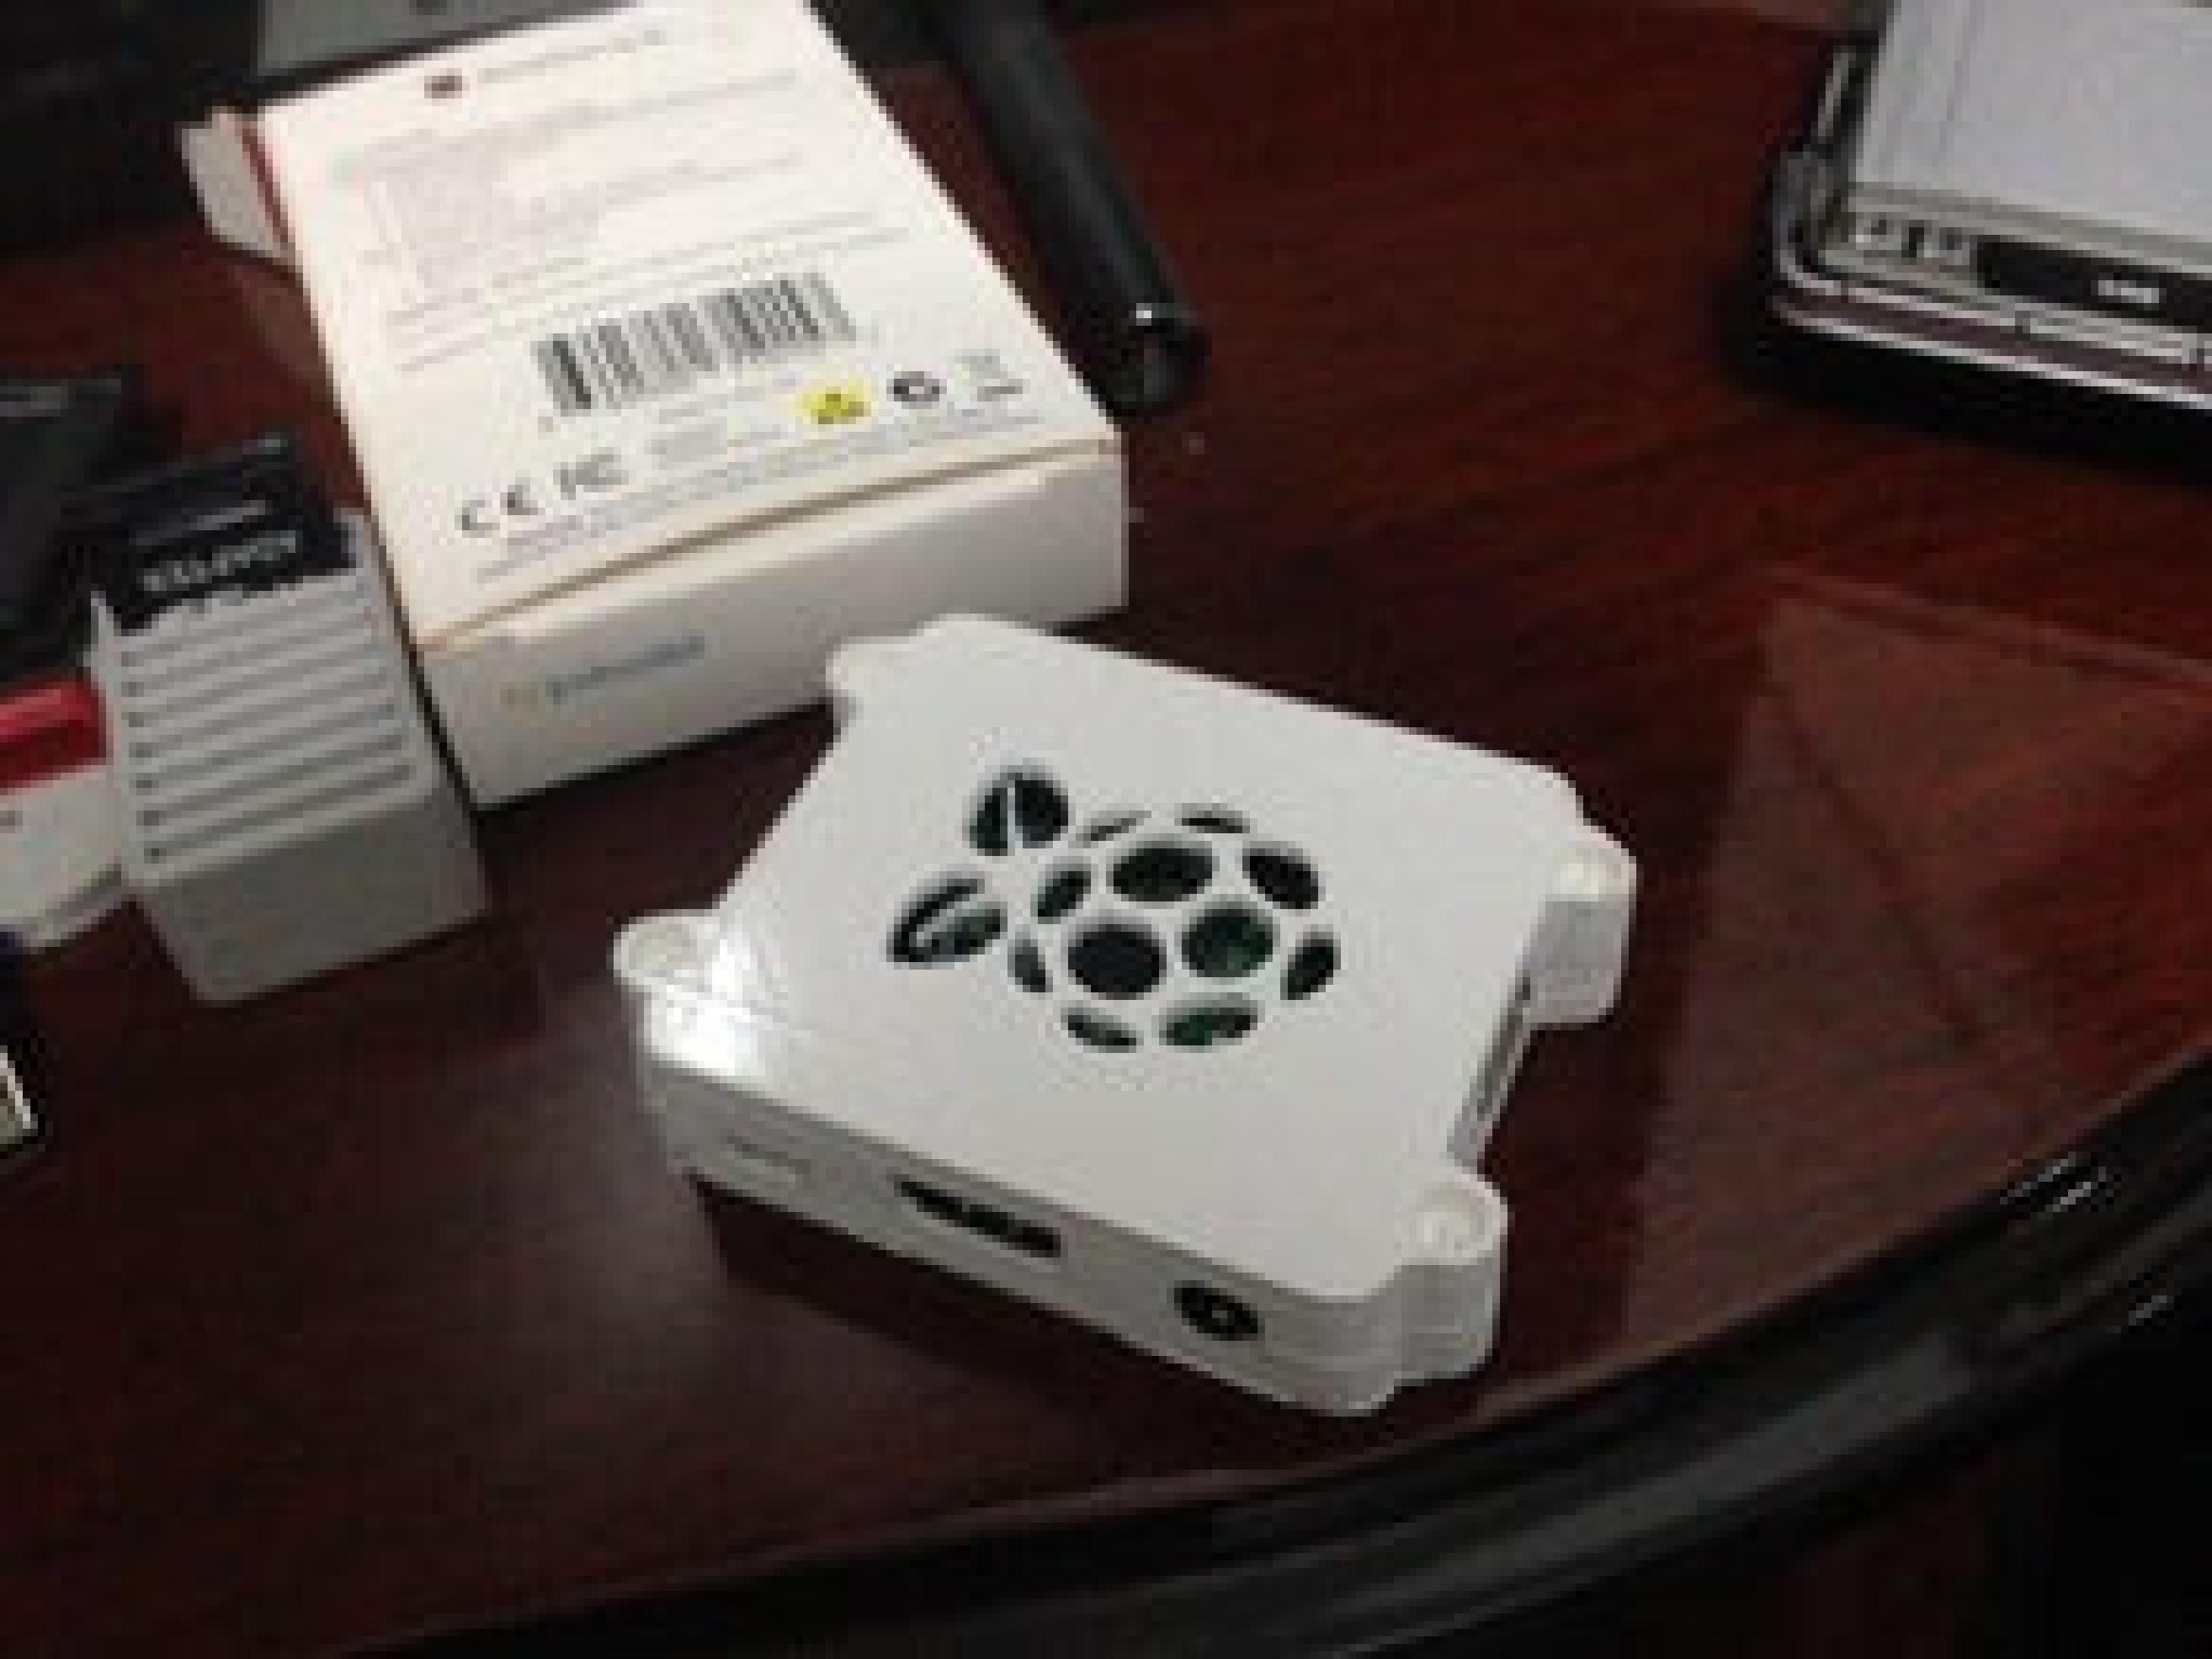 Raspberry Pi A + Kılıfı Koruma Kabı Vidalar Hariç 1 Adet